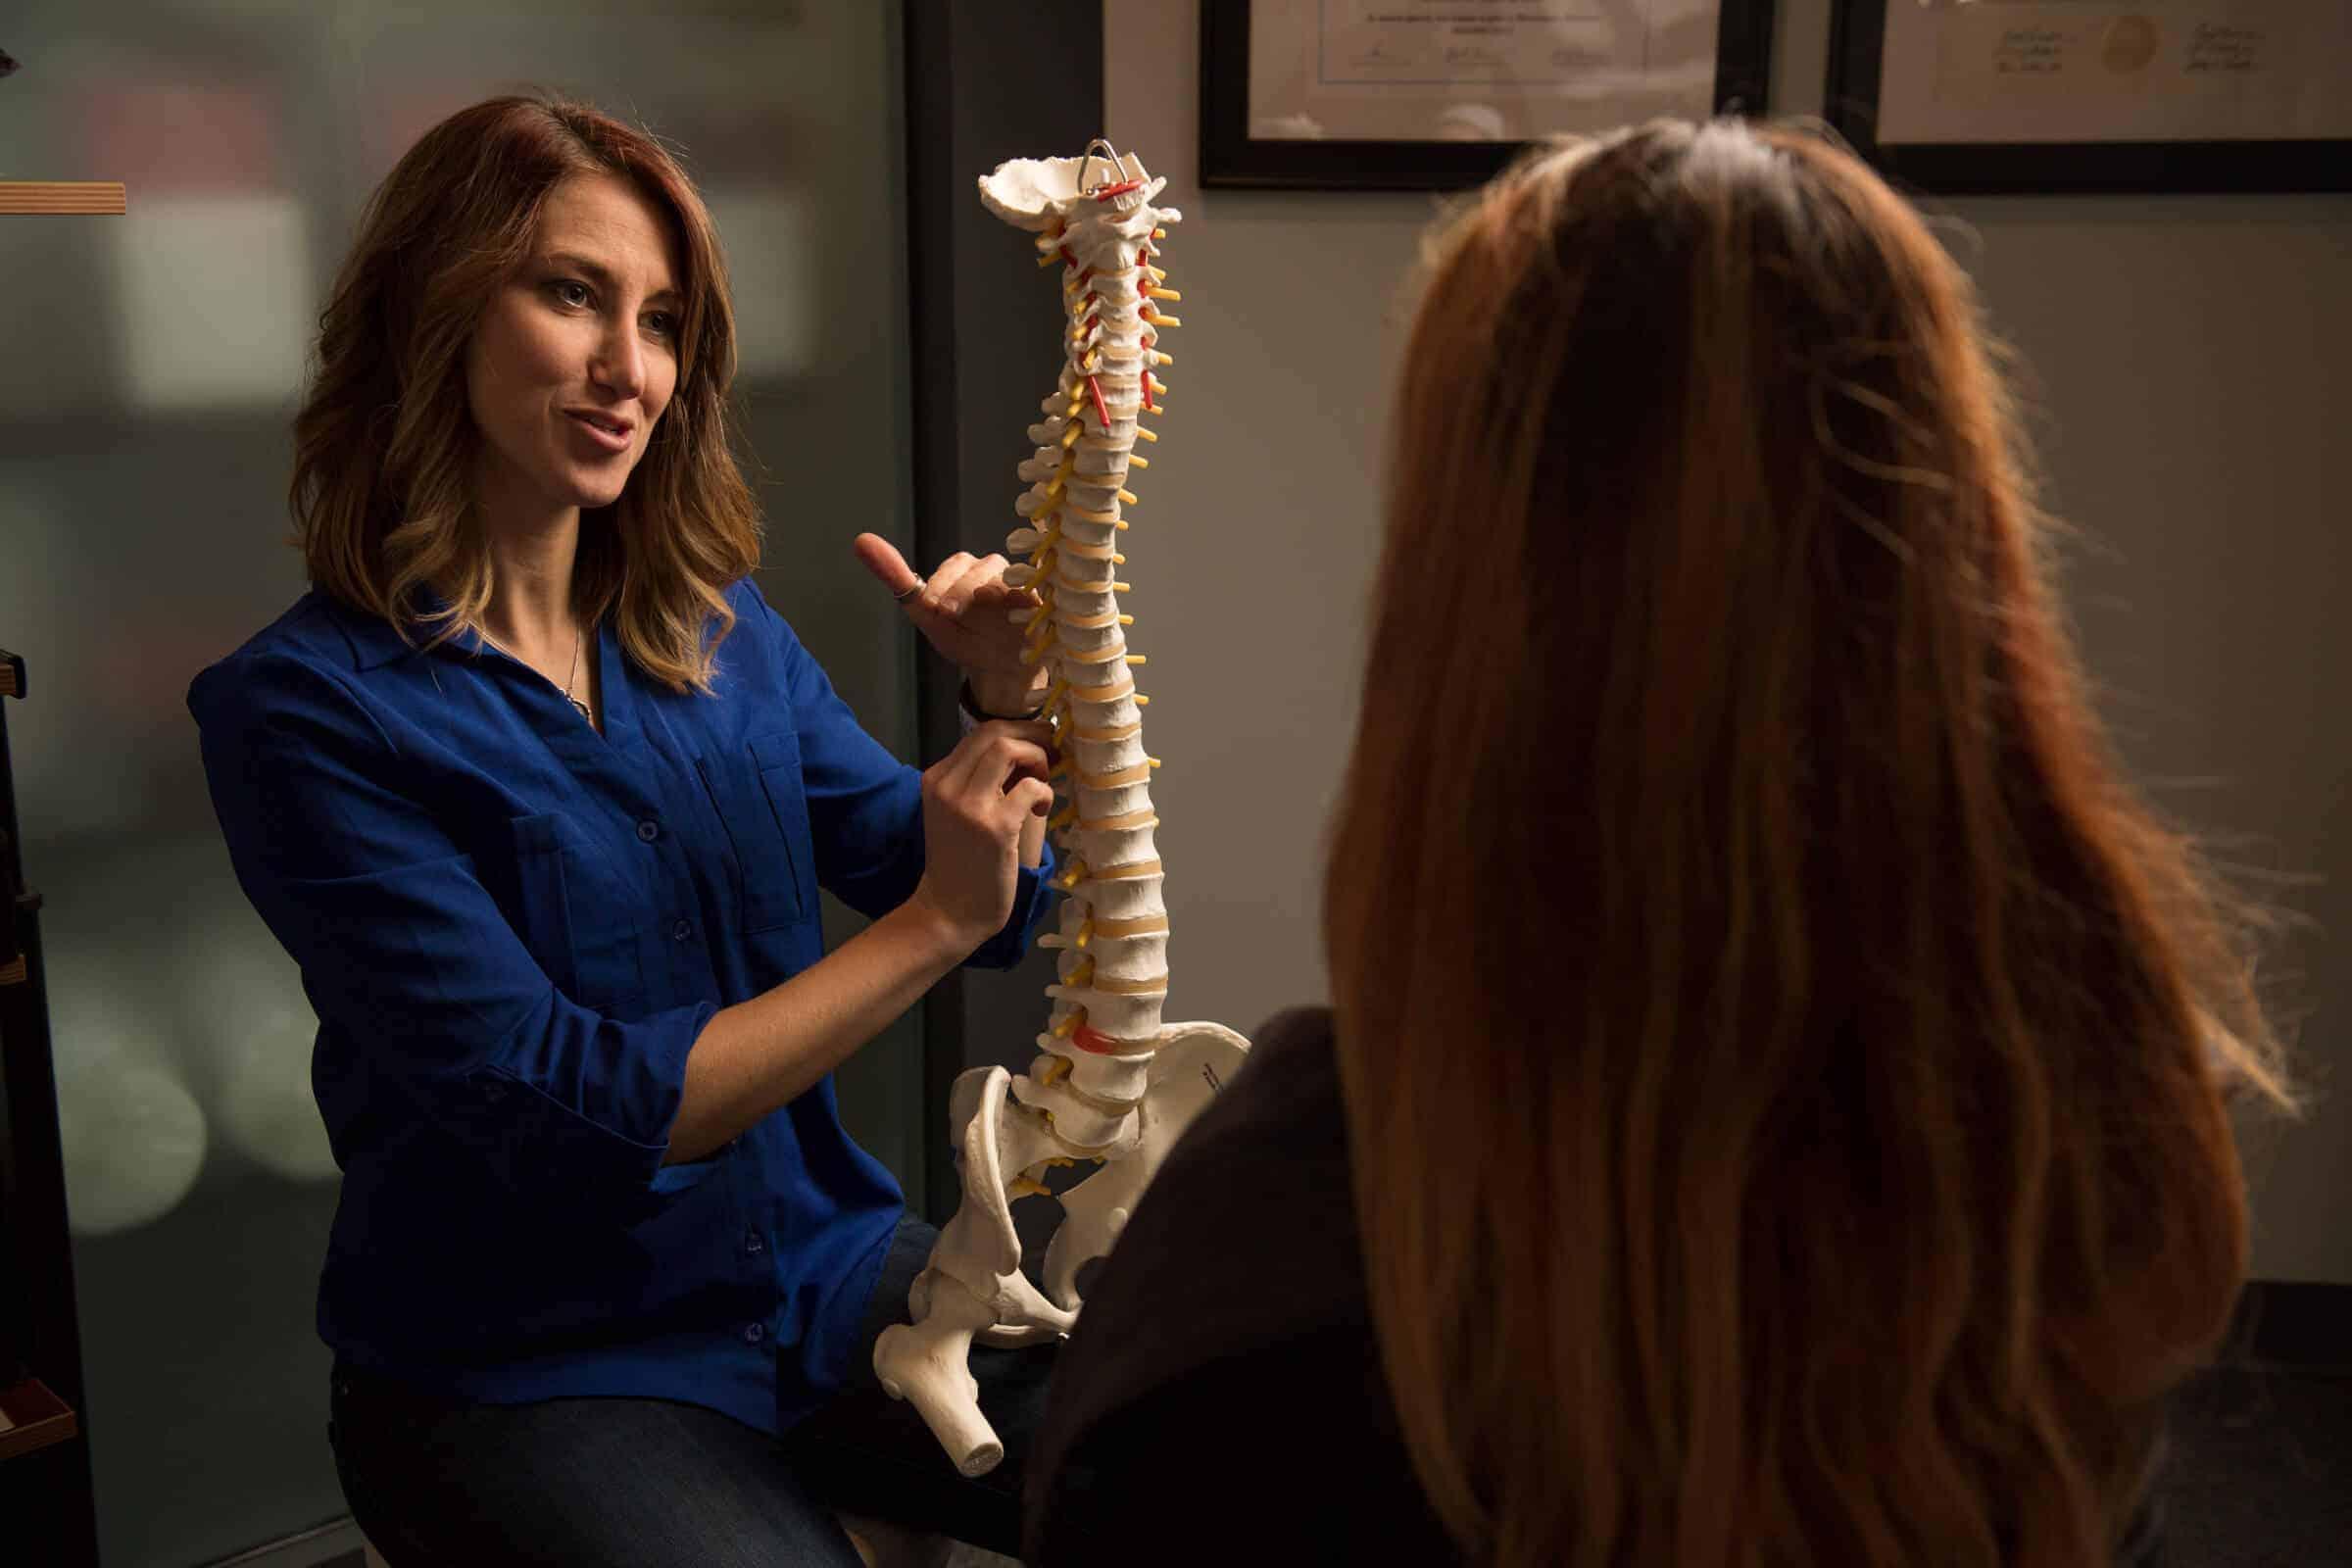 Dr. Jasmine Craner explaining how the spine works